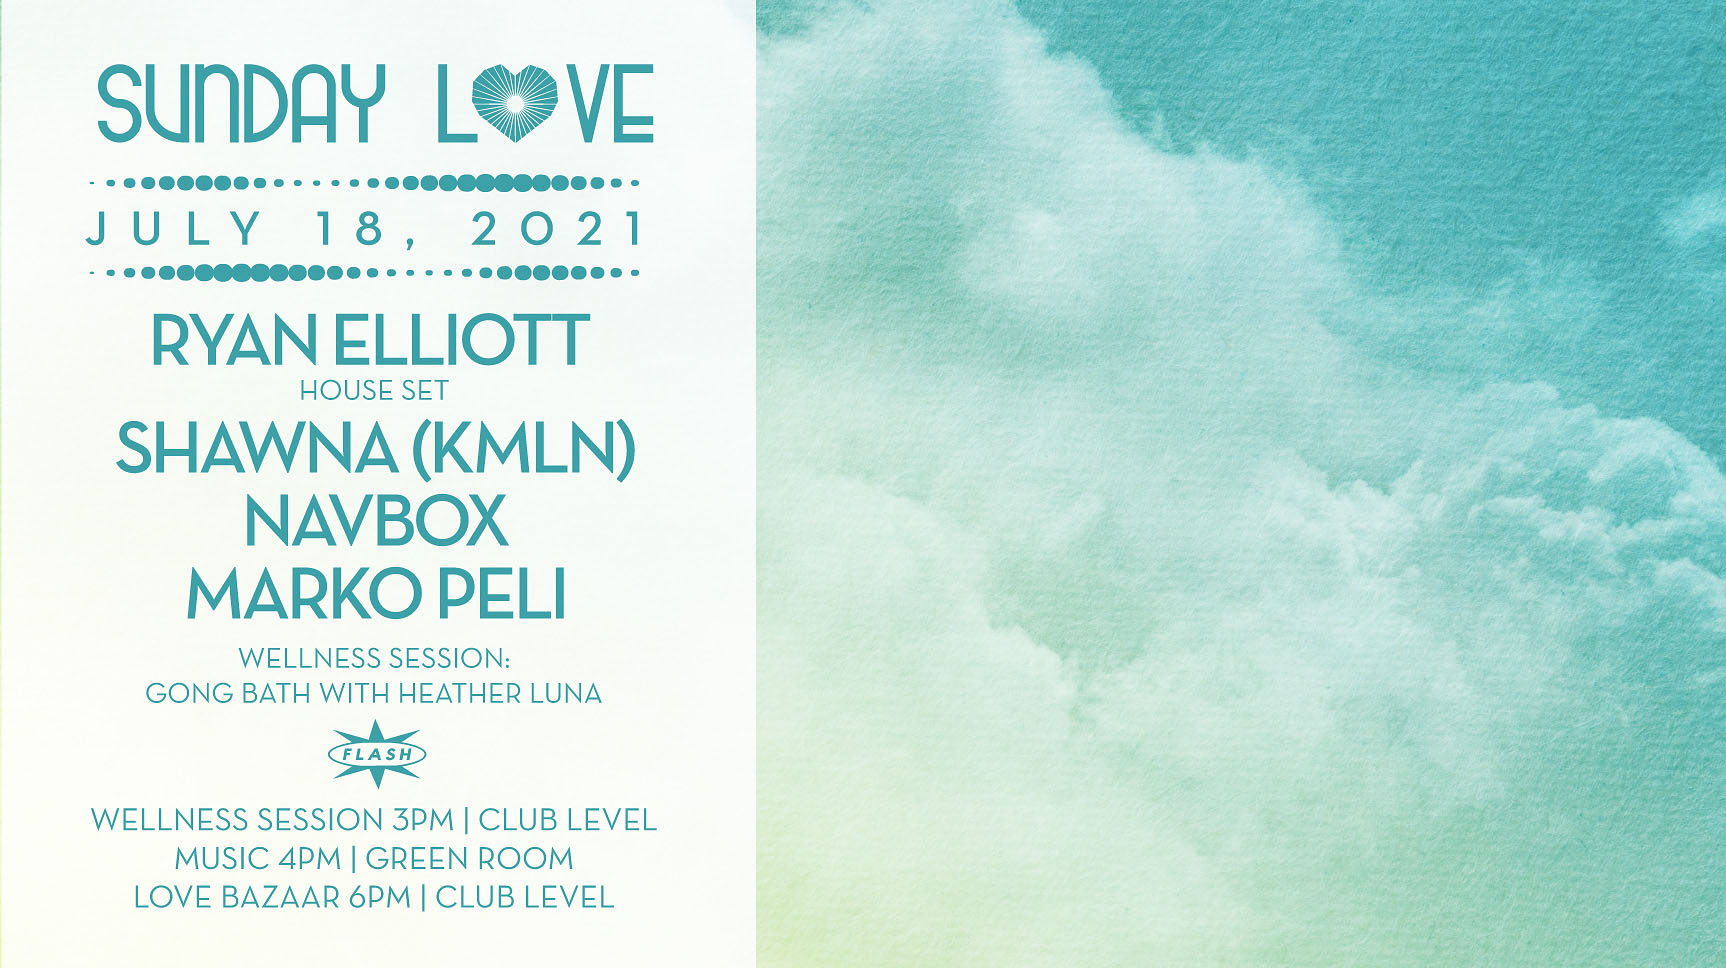 Sunday Love: Ryan Elliott - Shawna (KMLN) - Navbox - Marko Peli